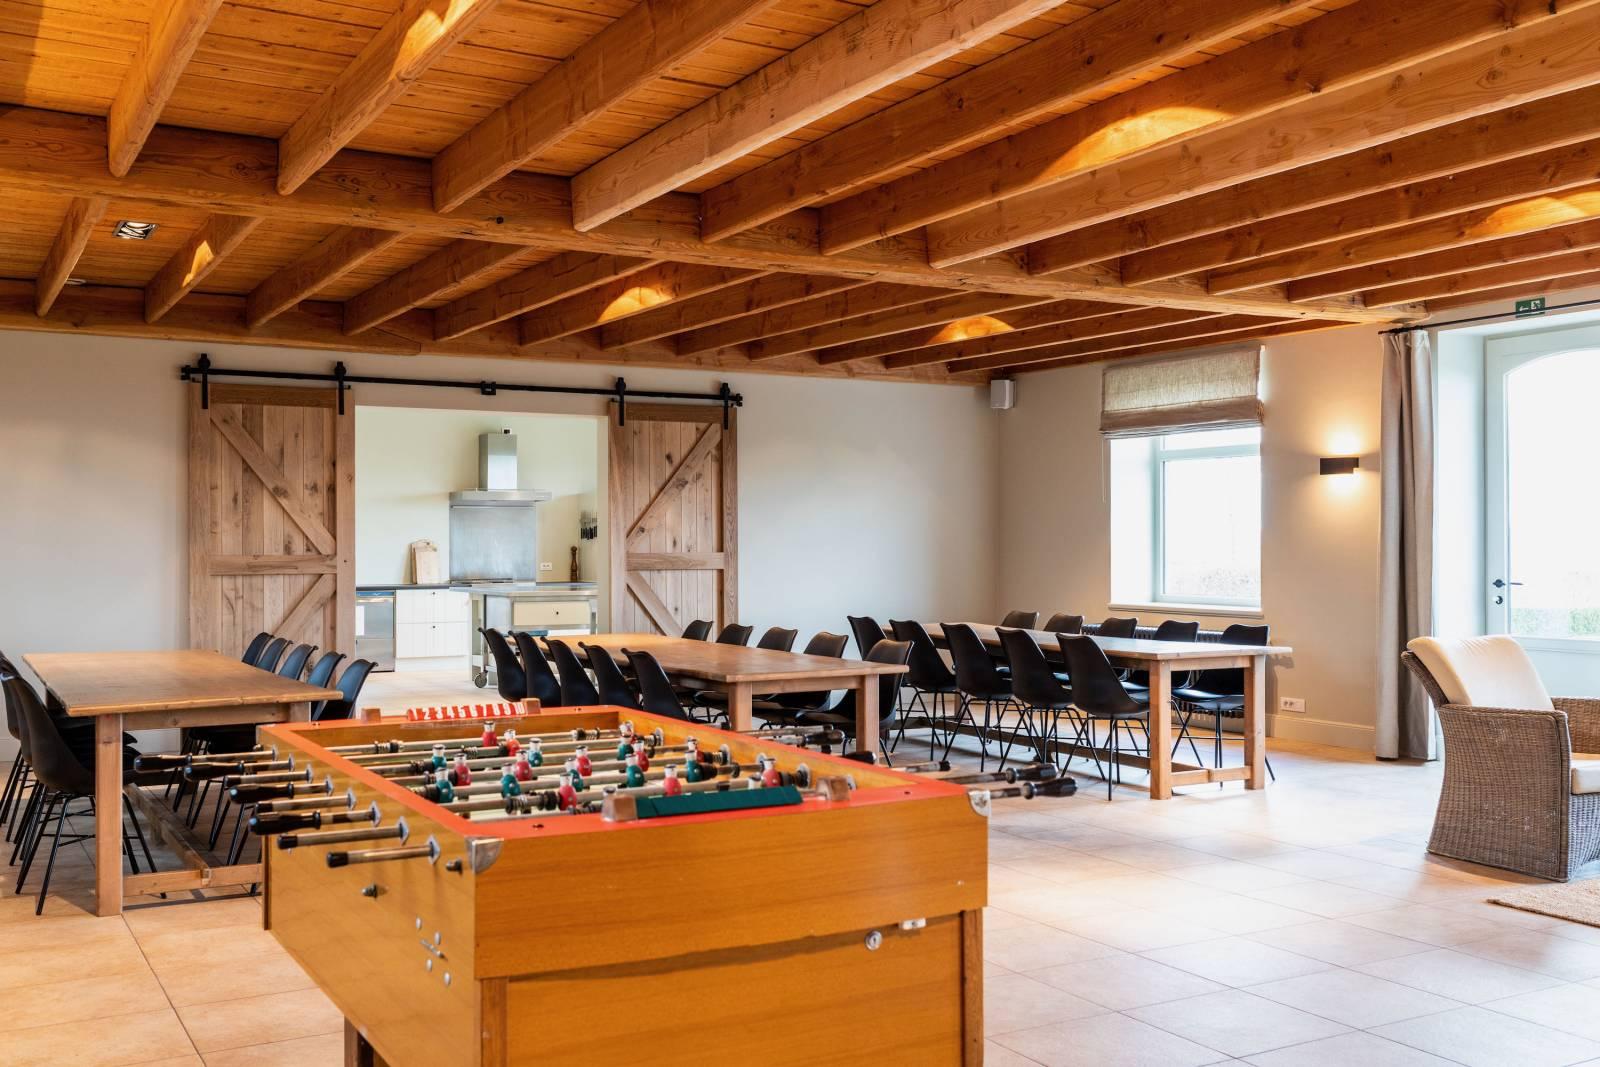 Hazegras - Feestzaal te Knokke - House of Weddings - 11